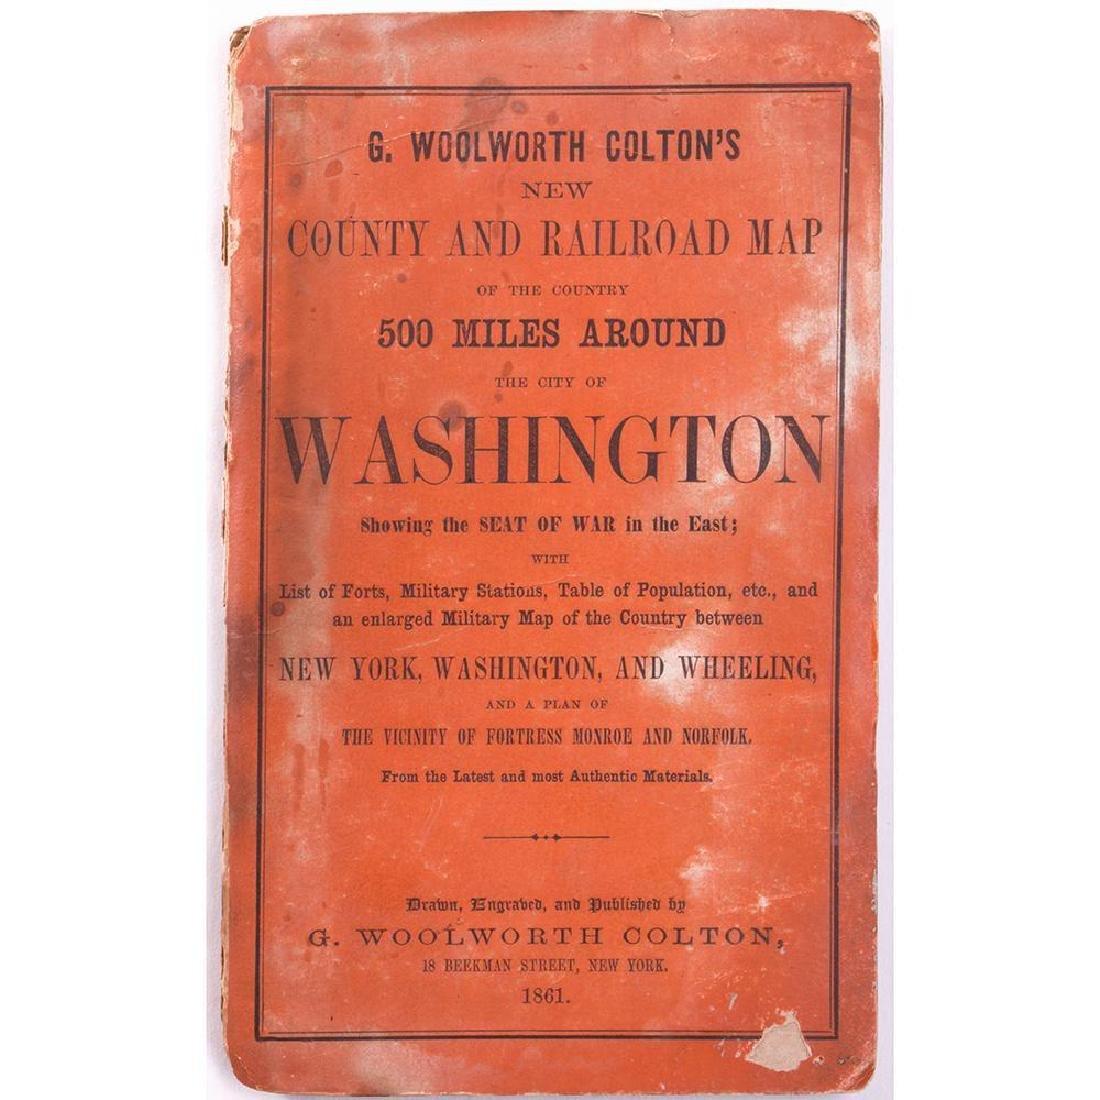 G.Woolworth Colton, Map of Washington, 19861